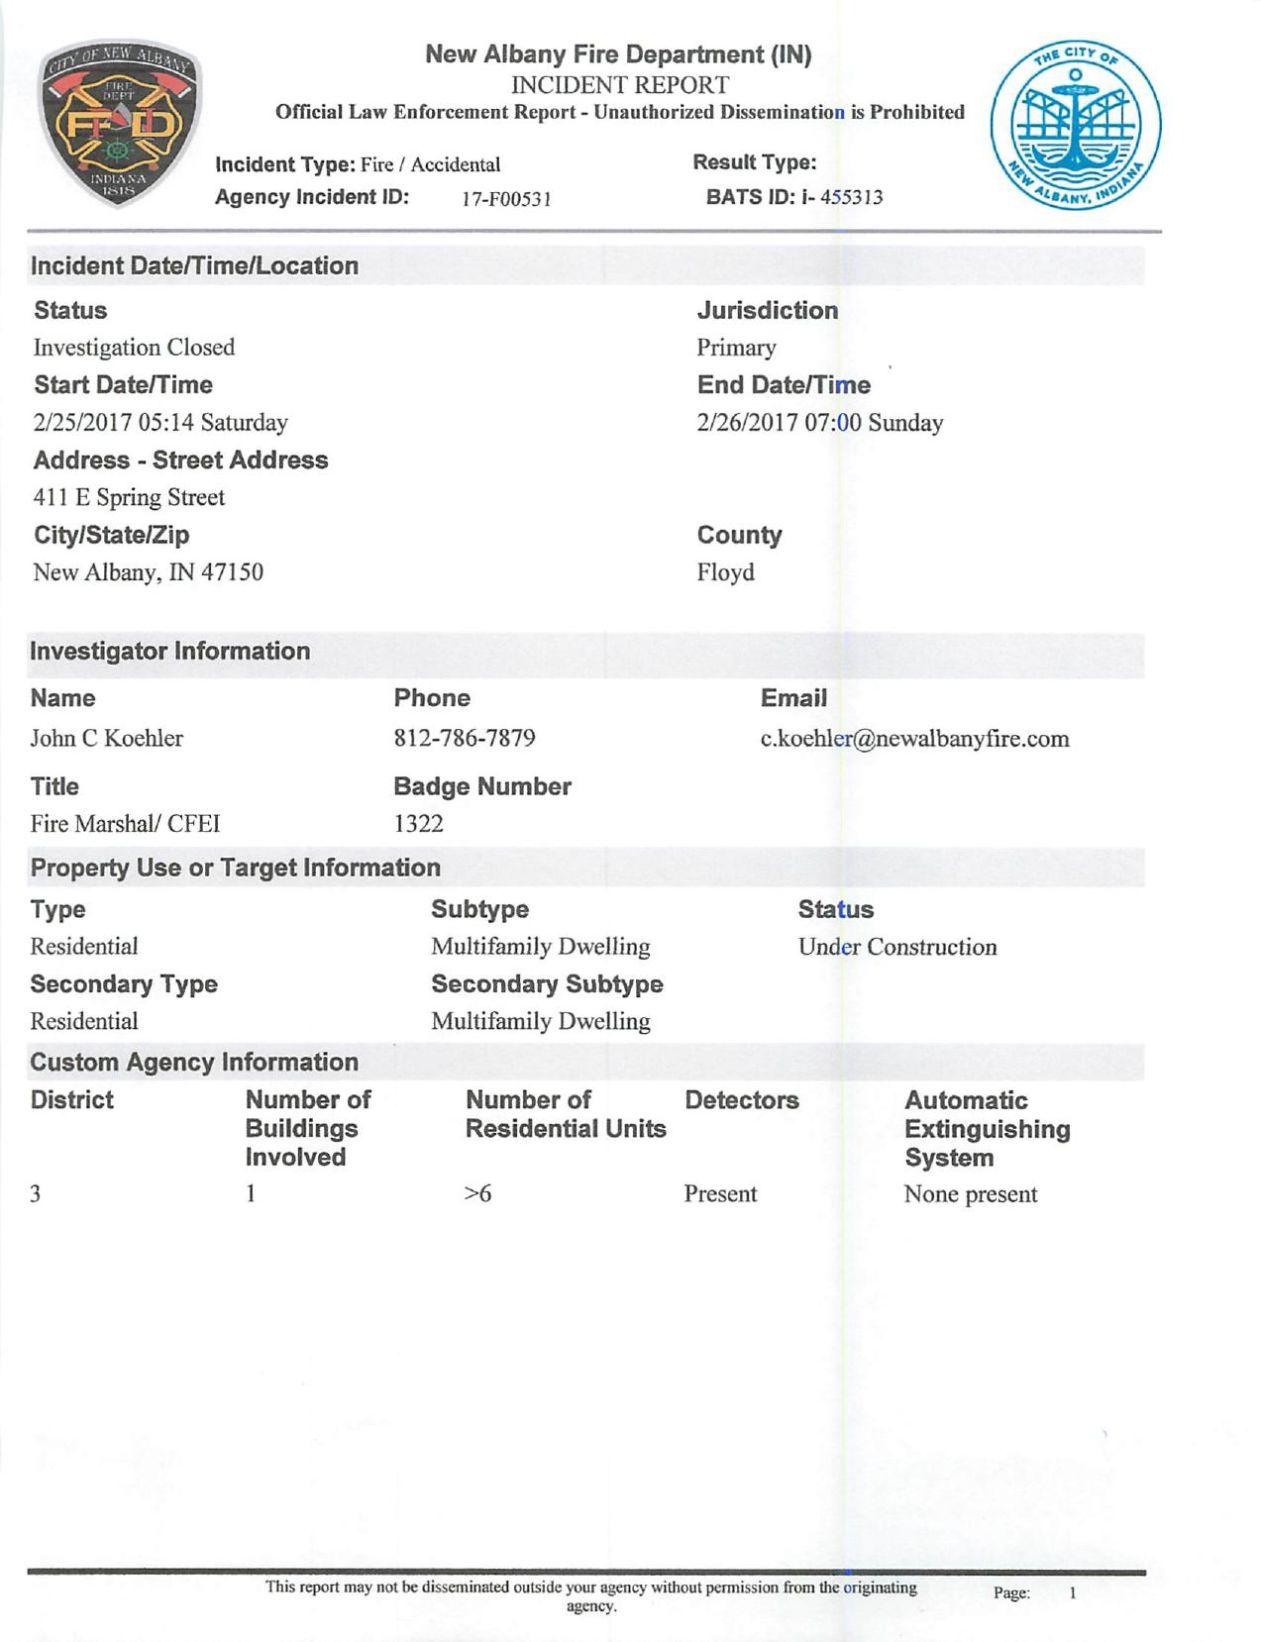 merveilleux Download PDF The Breakwater fire incident report